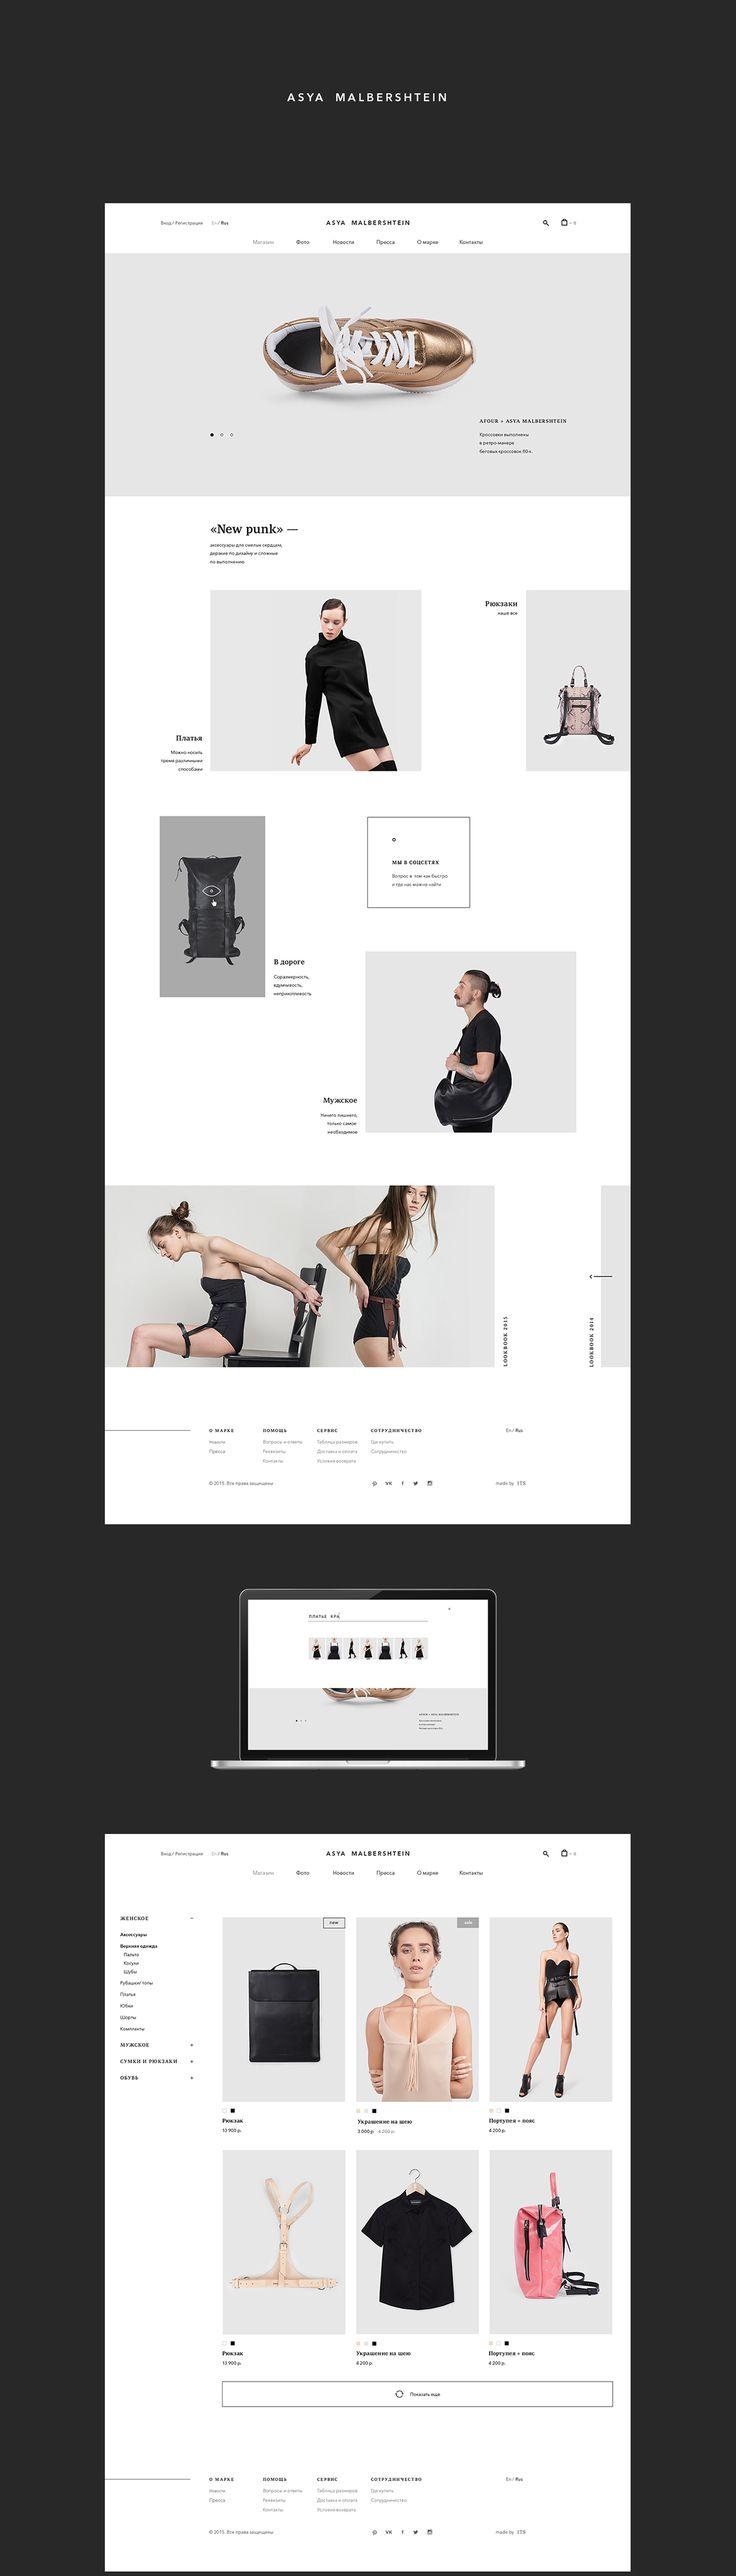 Asya Malbershtein on Web Design Served